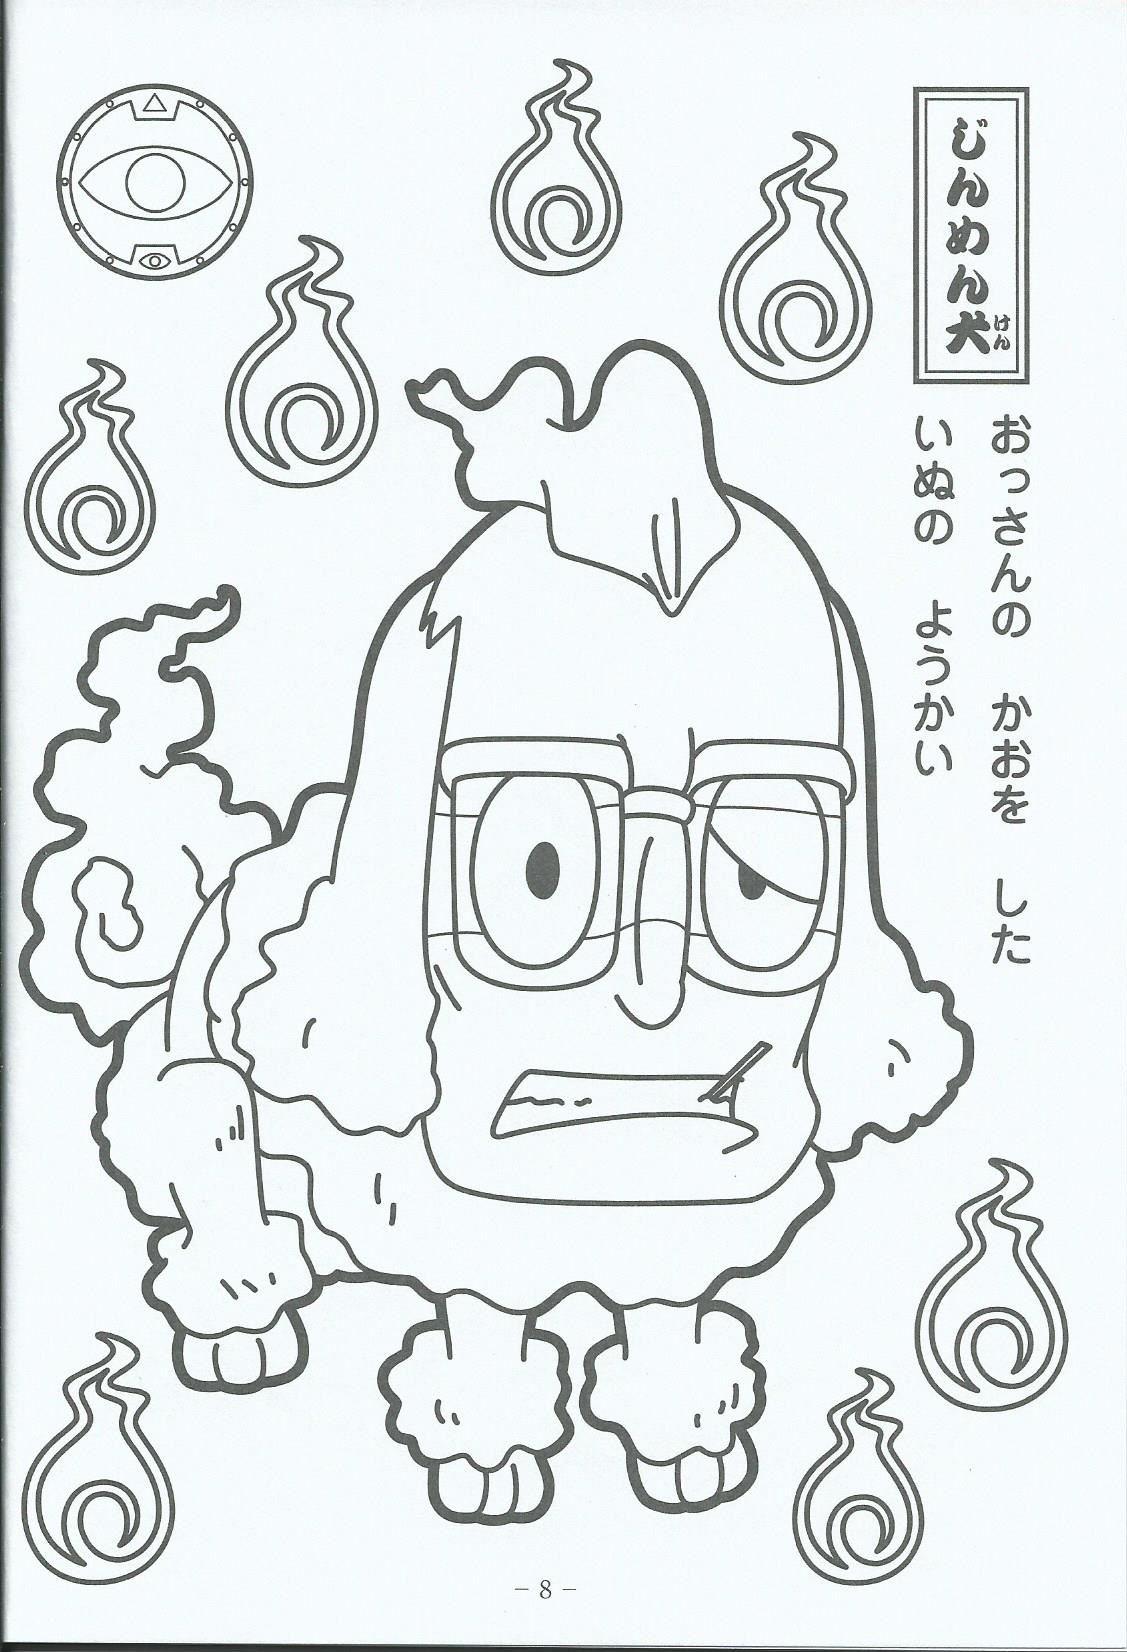 Youkai Jinmenken 애니메이션 및 미술 교육